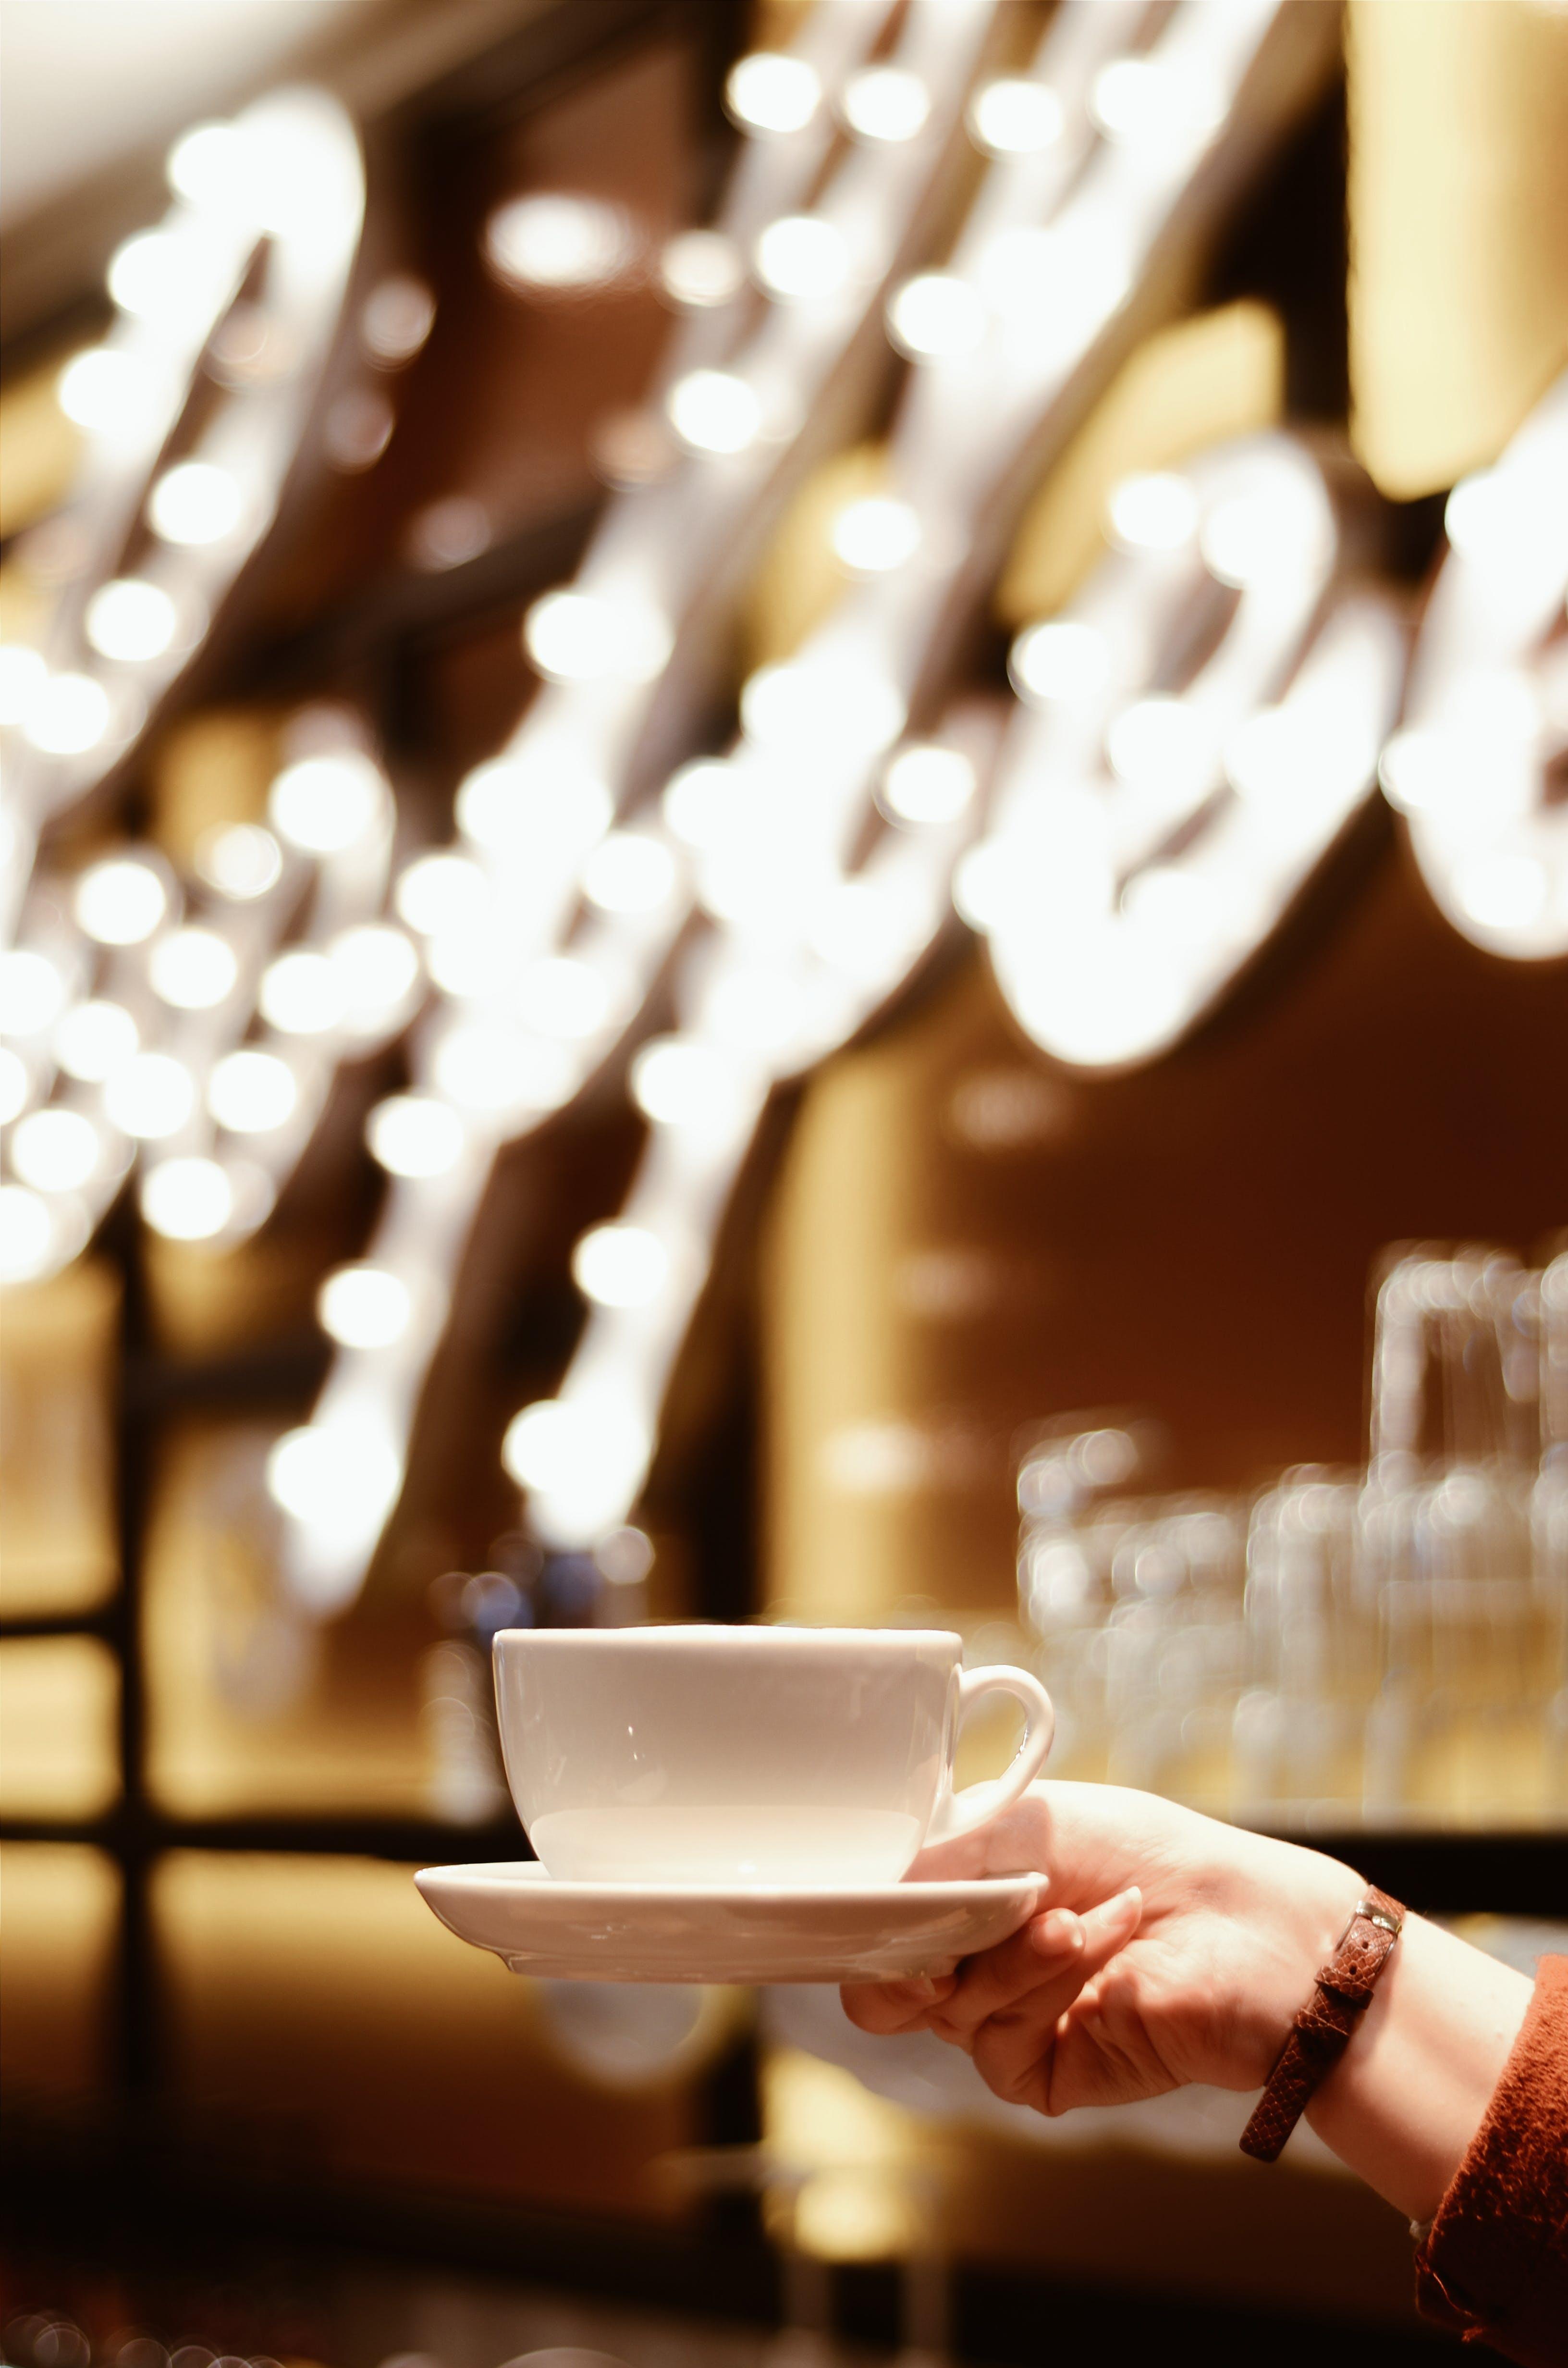 White Ceramic Coffee Cup